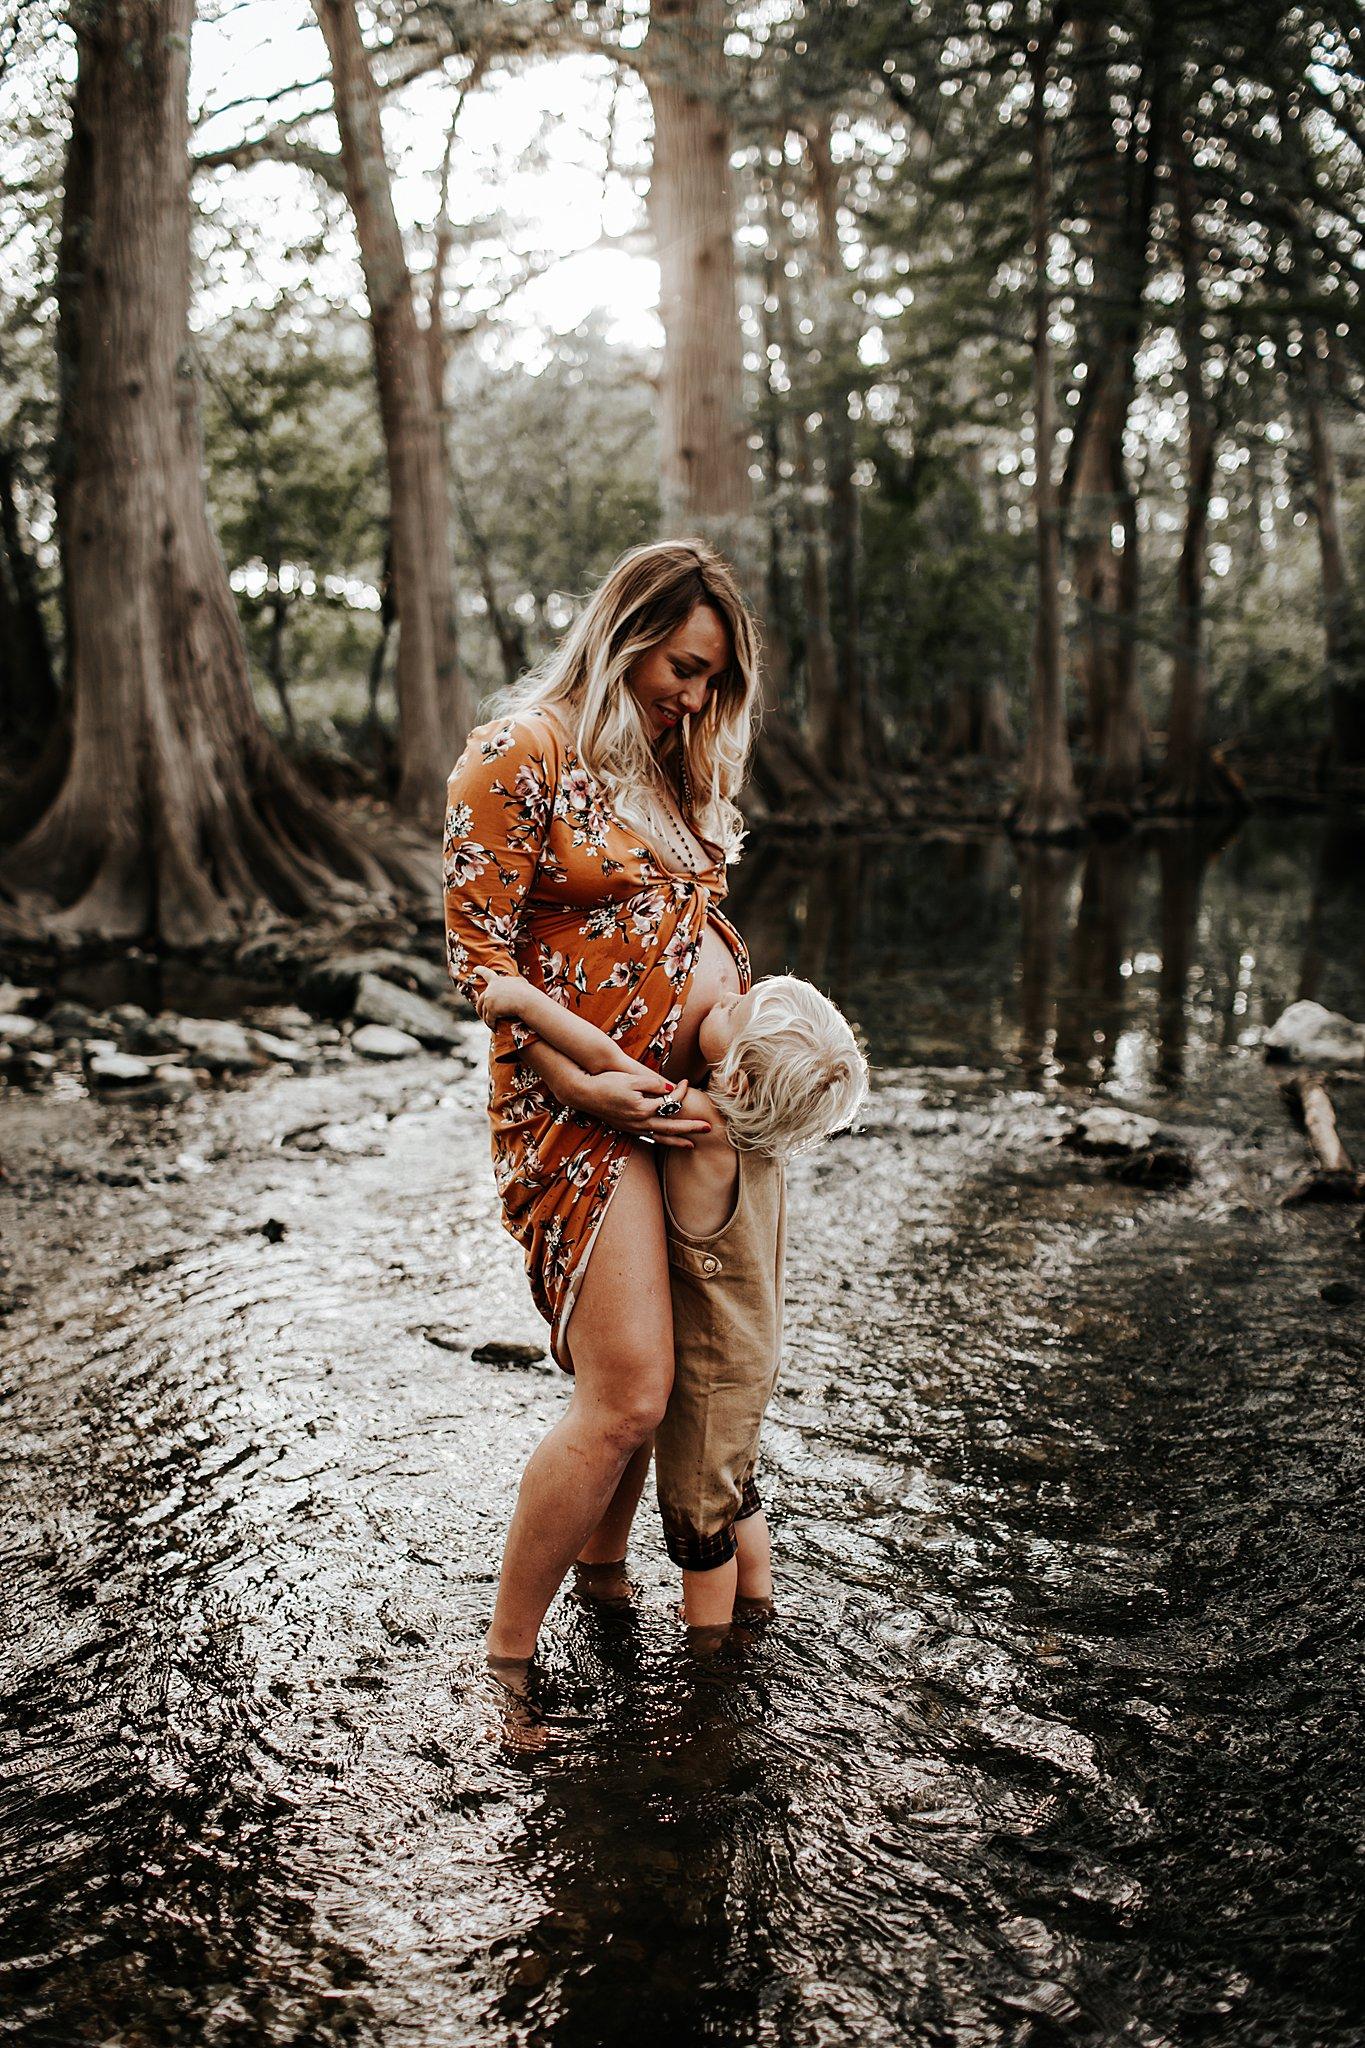 Shannon-San-Antonio-Maternity-Photographer-14_WEB.jpg